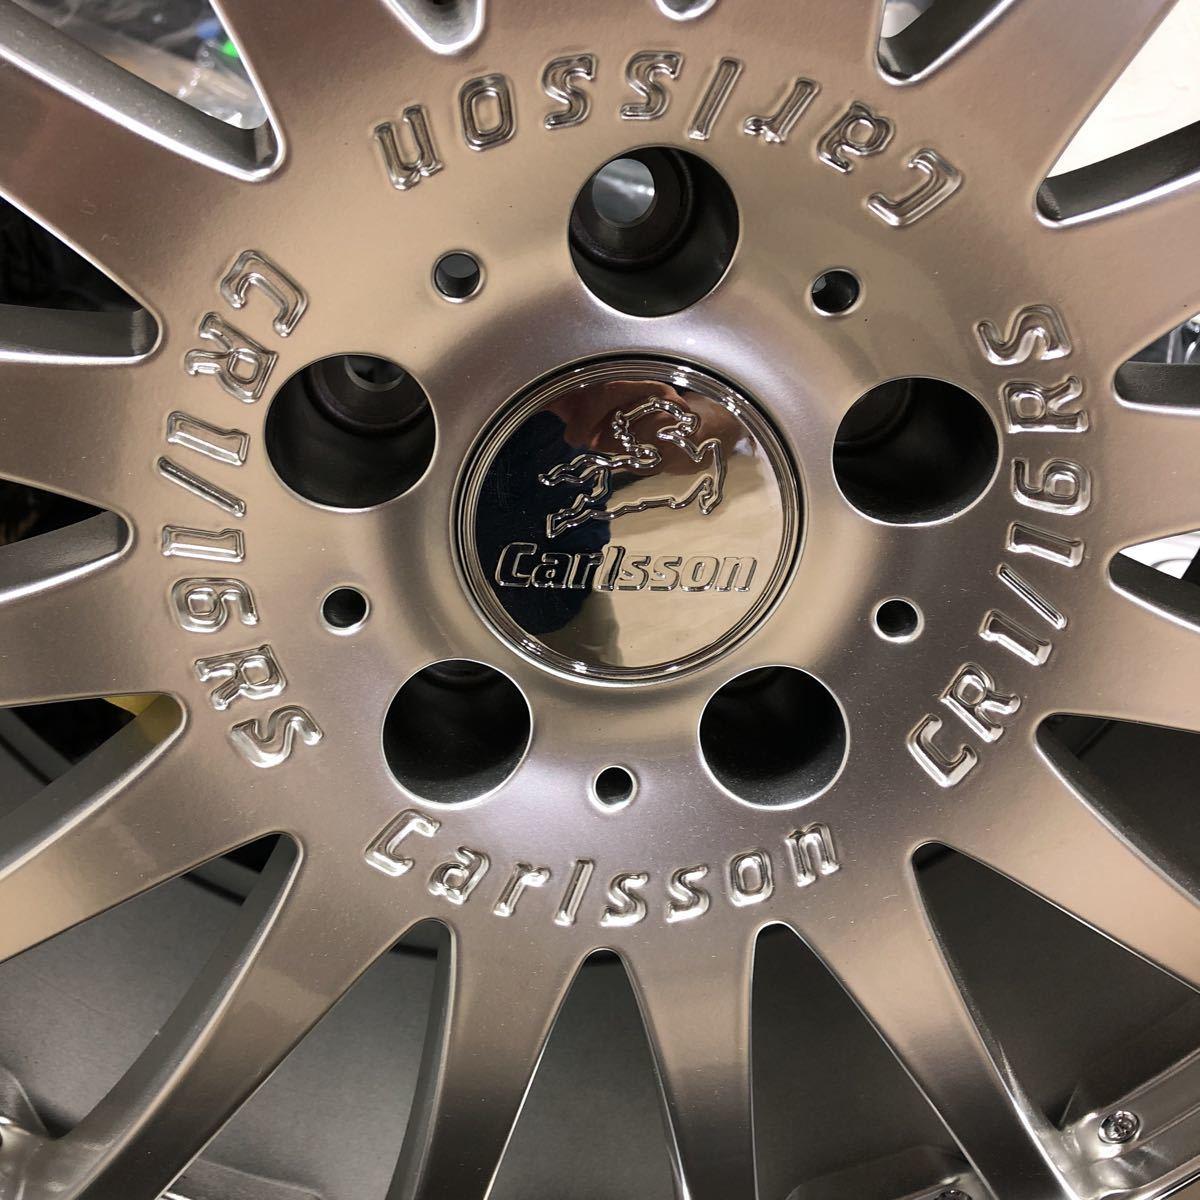 carlsson カールソン 21インチ Lexus LS 460 600 USF UVF 40 41 ハイブリッド ロング 新品 カールソン _画像2